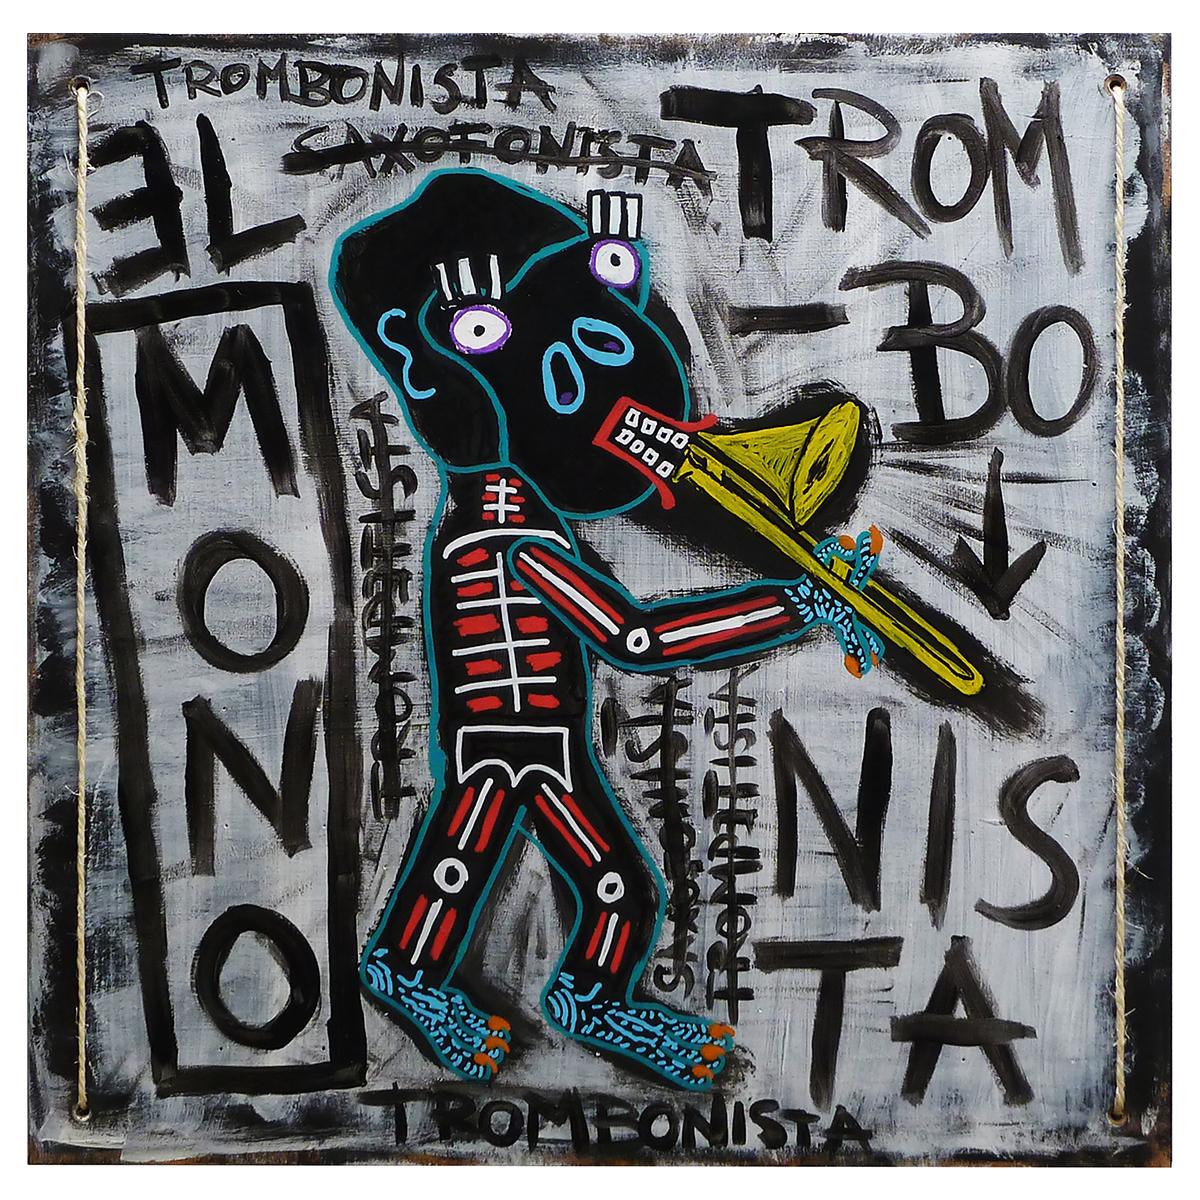 EL MONO TROMBONISTA - Frank Willems